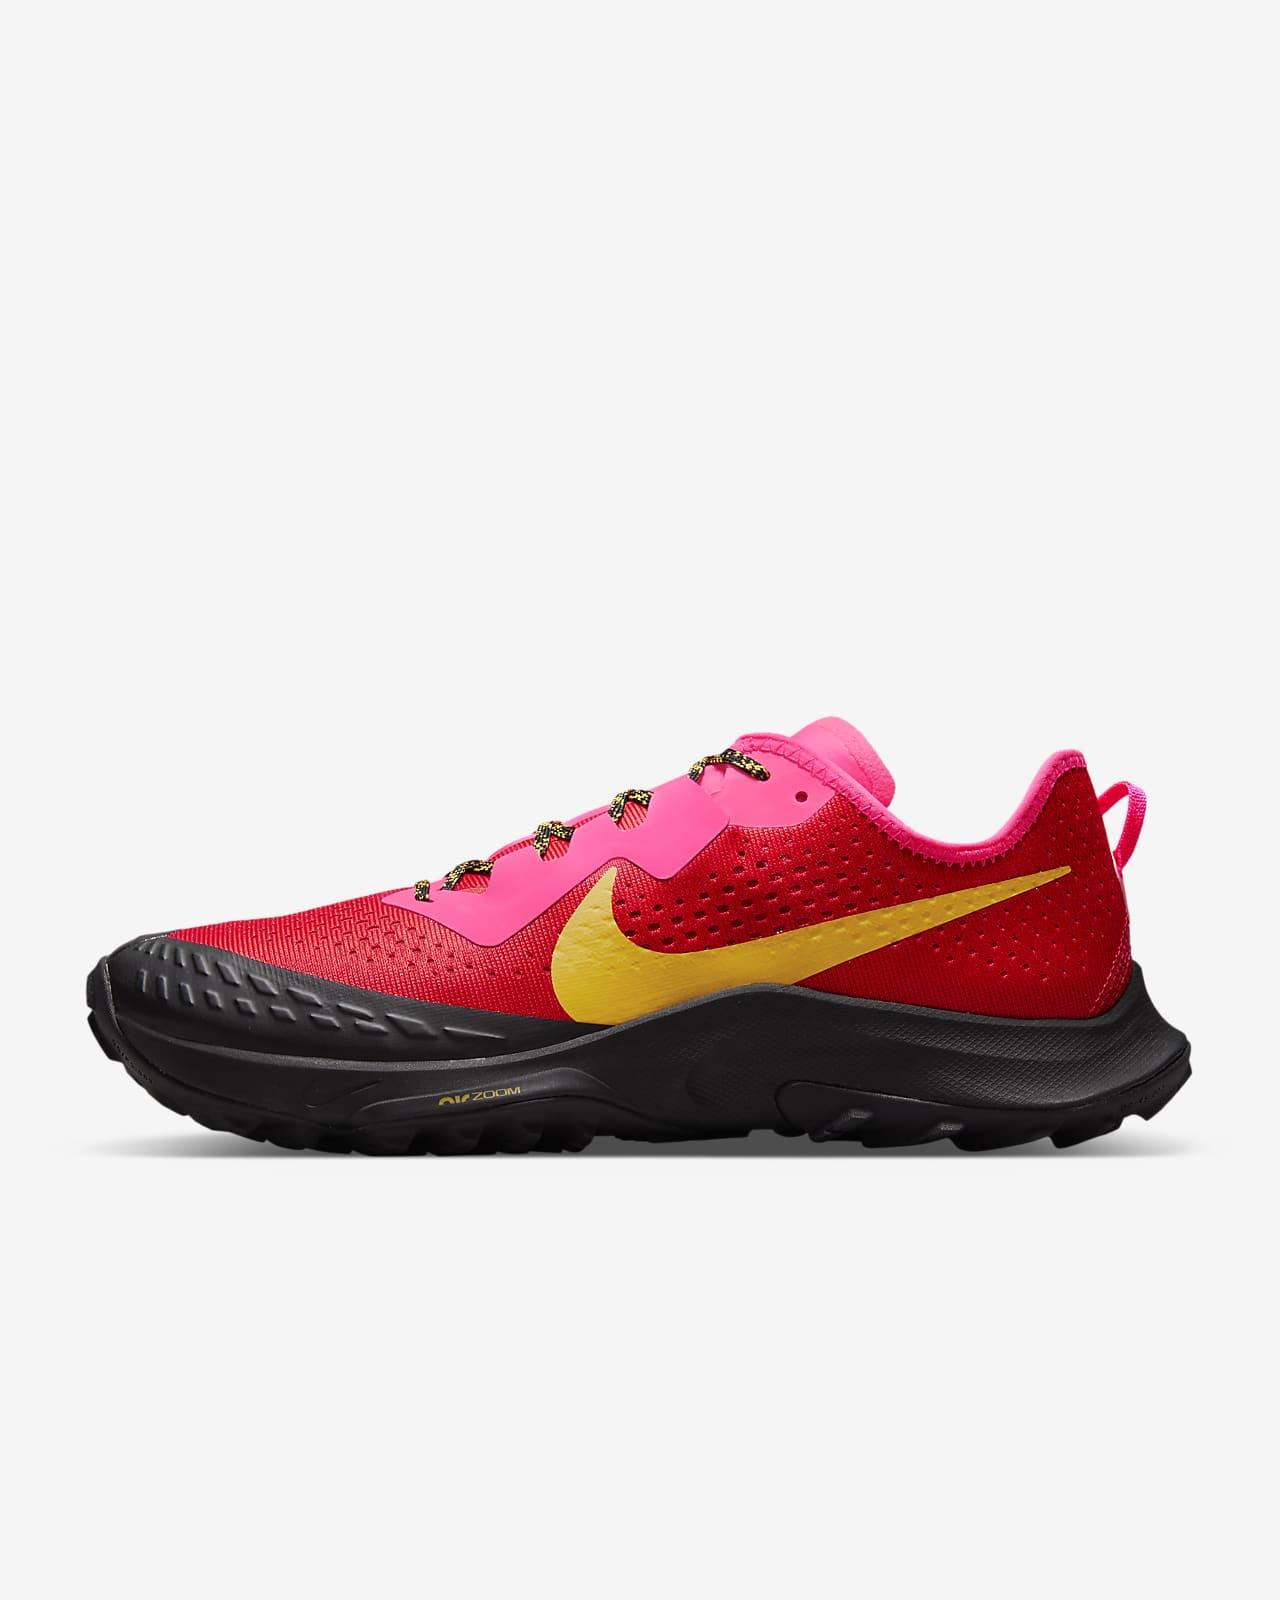 Мужские кроссовки для трейлраннинга Nike Air Zoom Terra Kiger 7